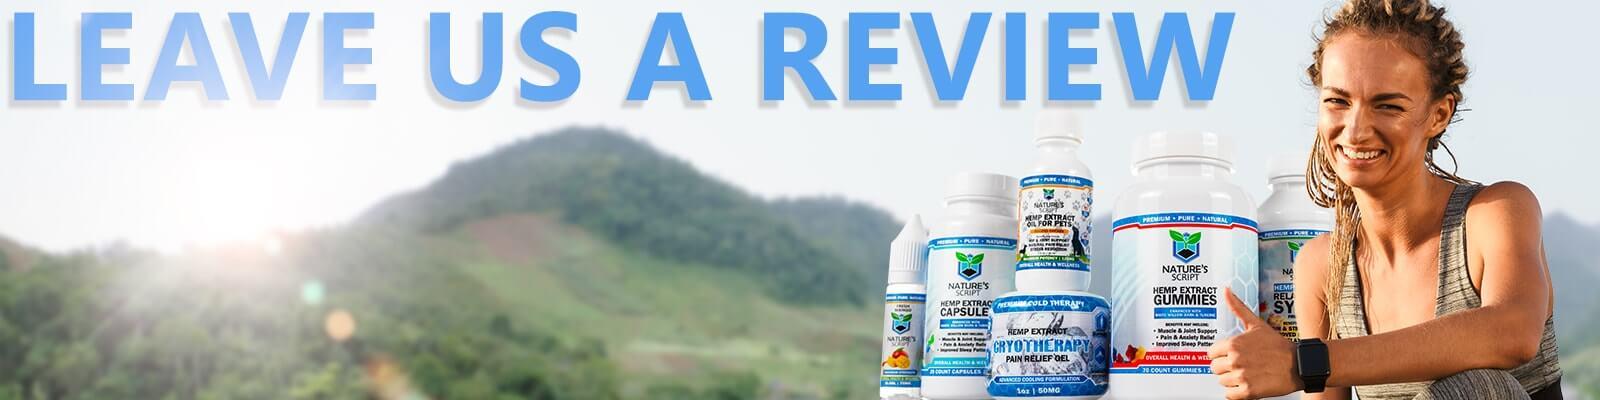 cbd review banner